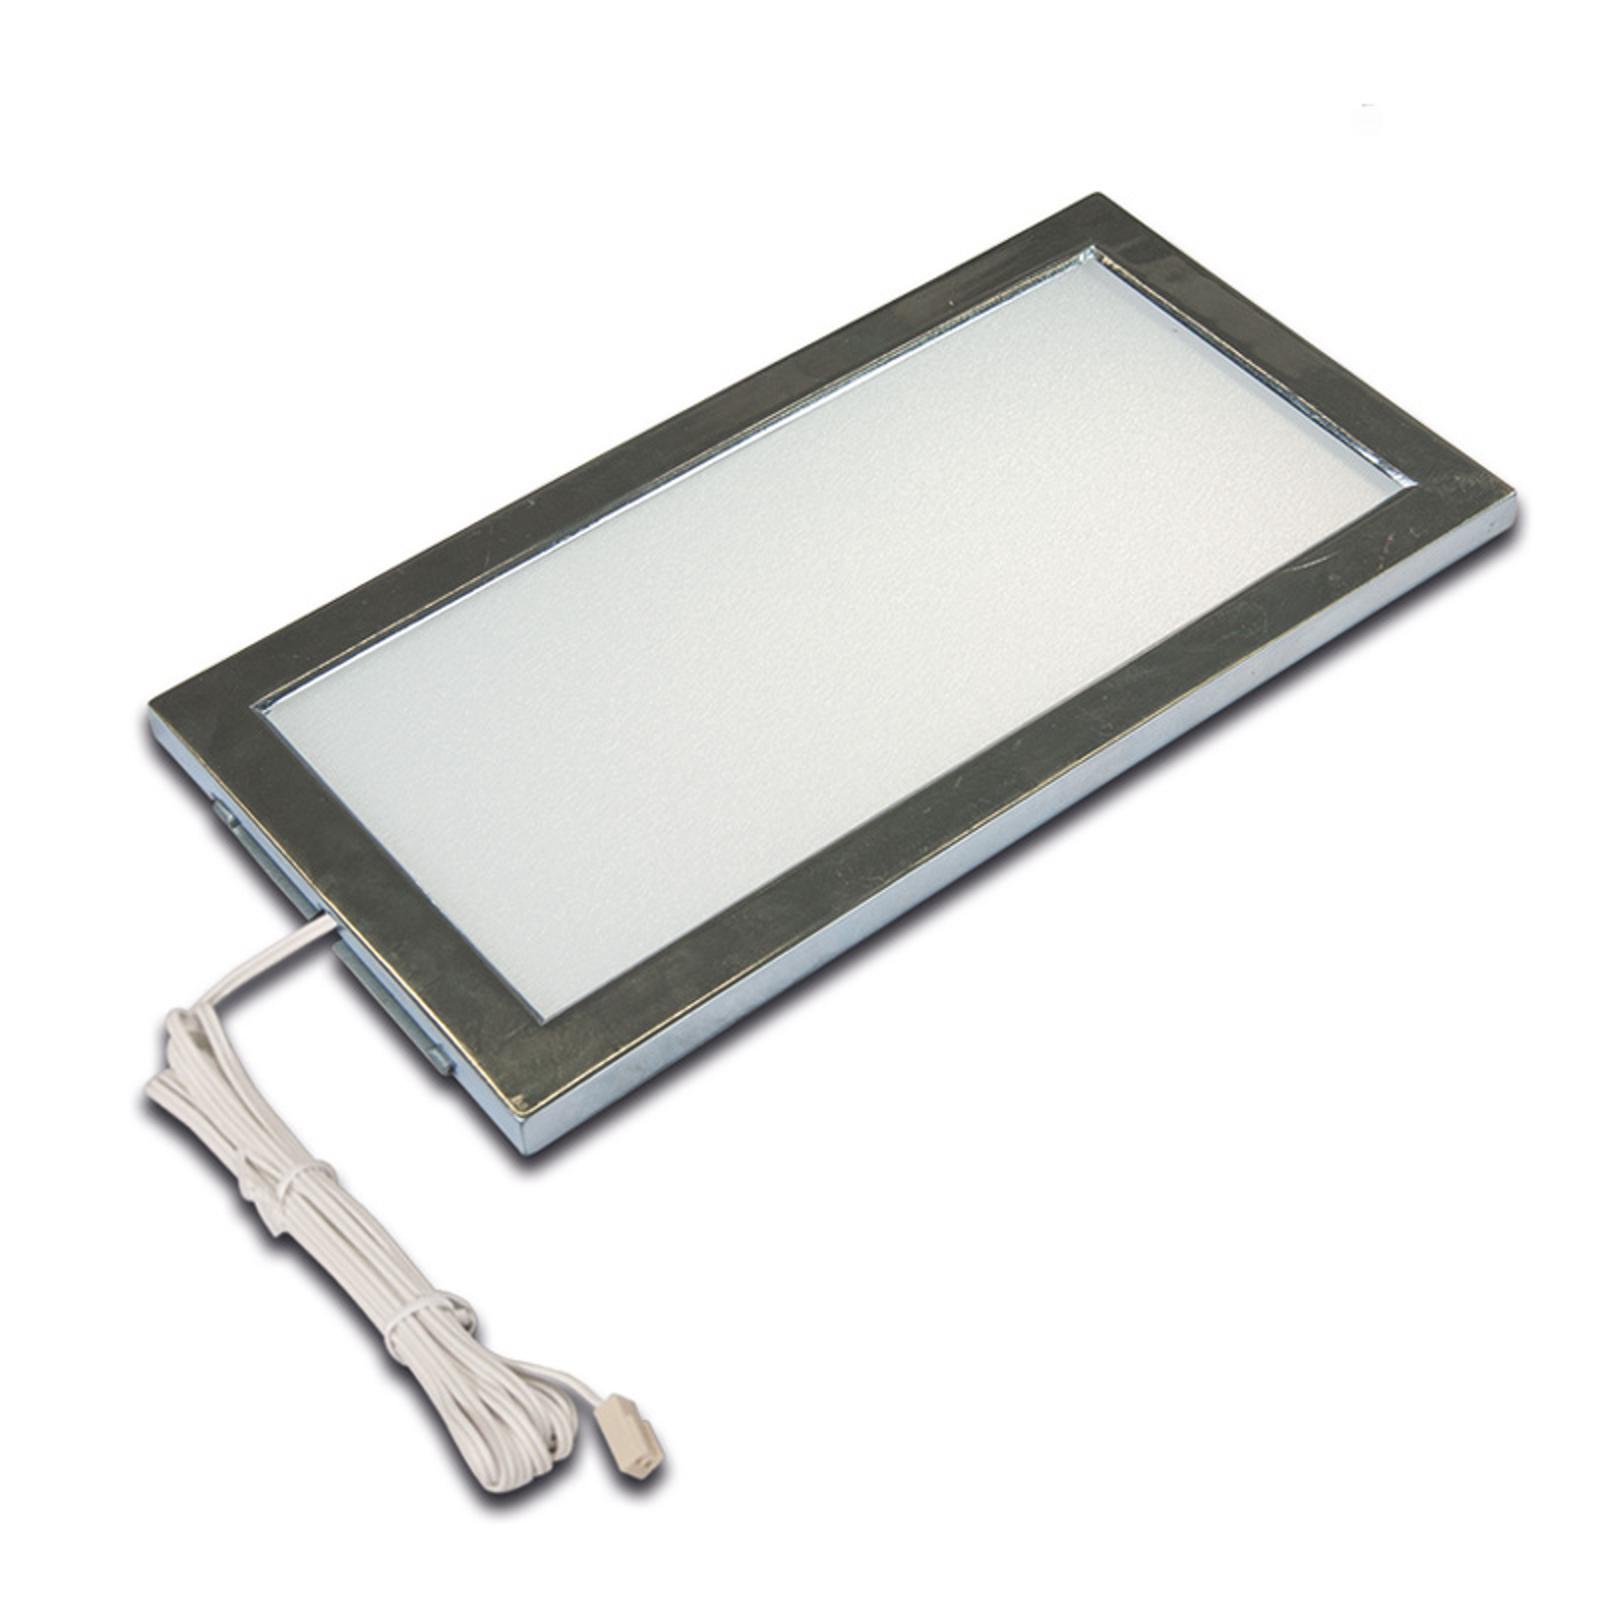 Flat under-cabinet light LED Sky - cool white_4514367_1